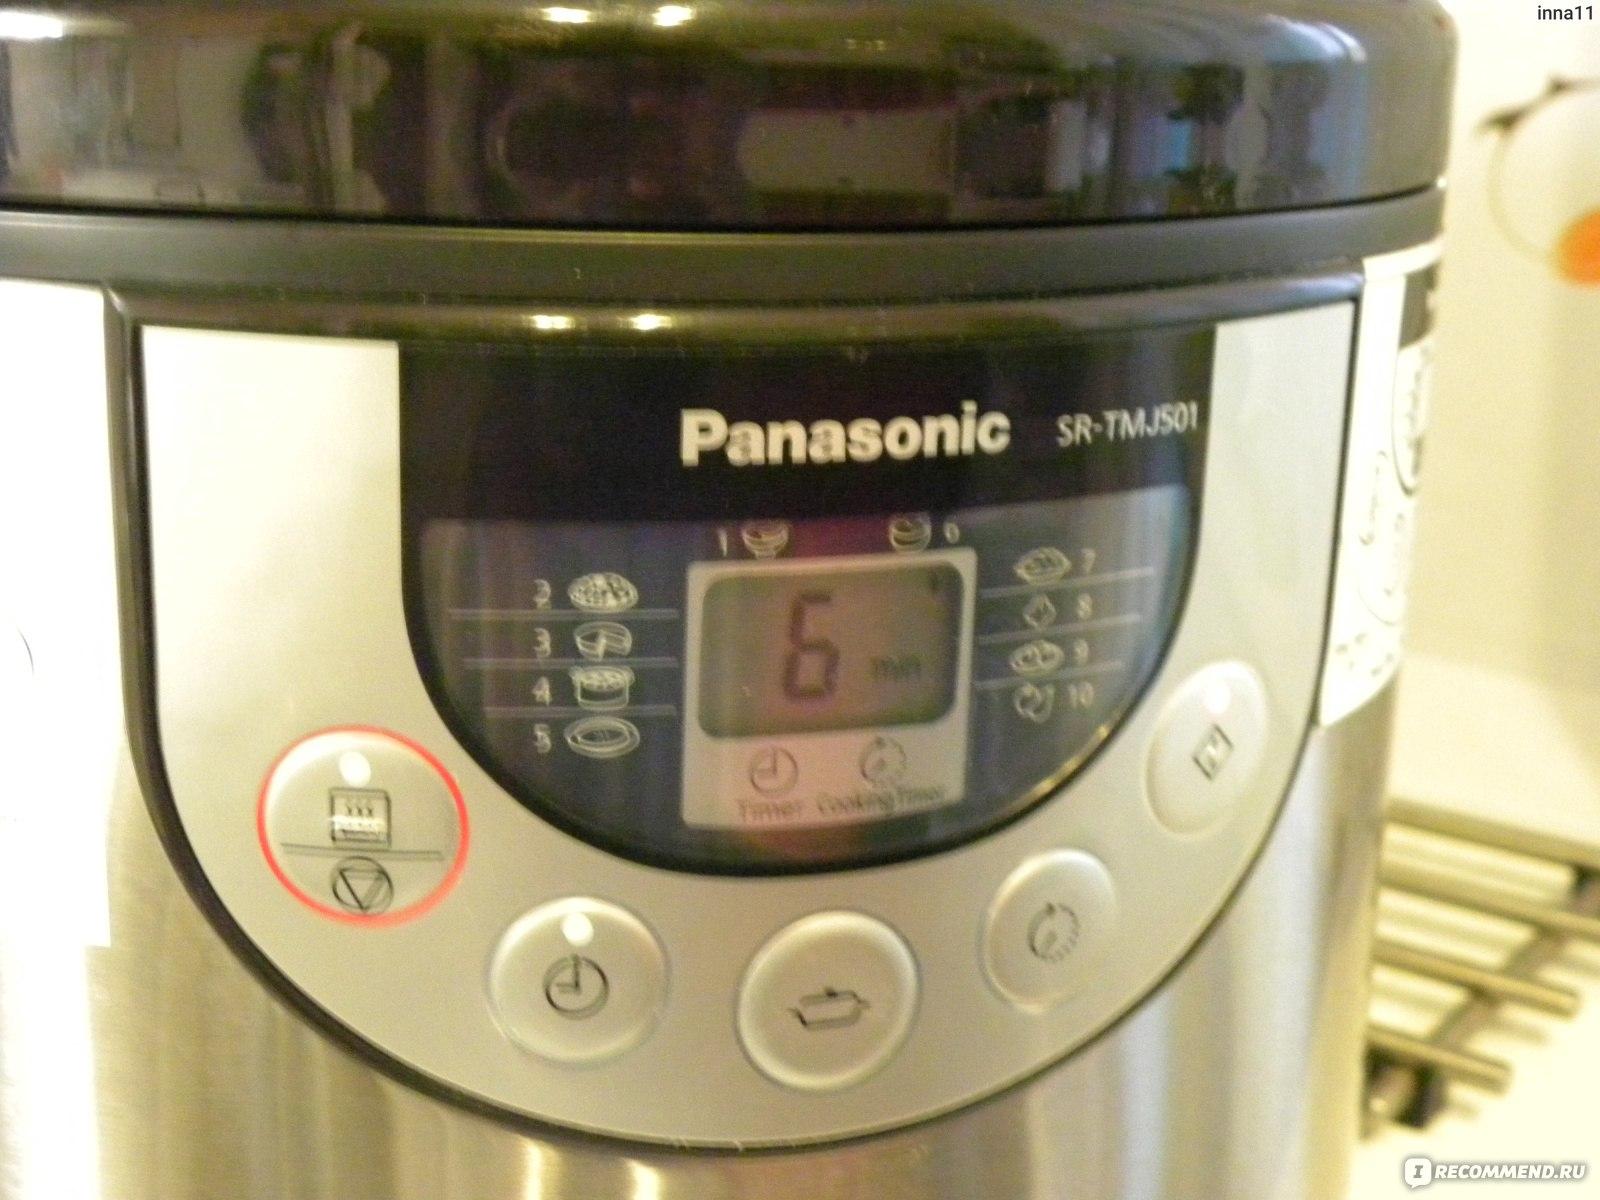 Panasonic Sr-Tmj501 Инструкция